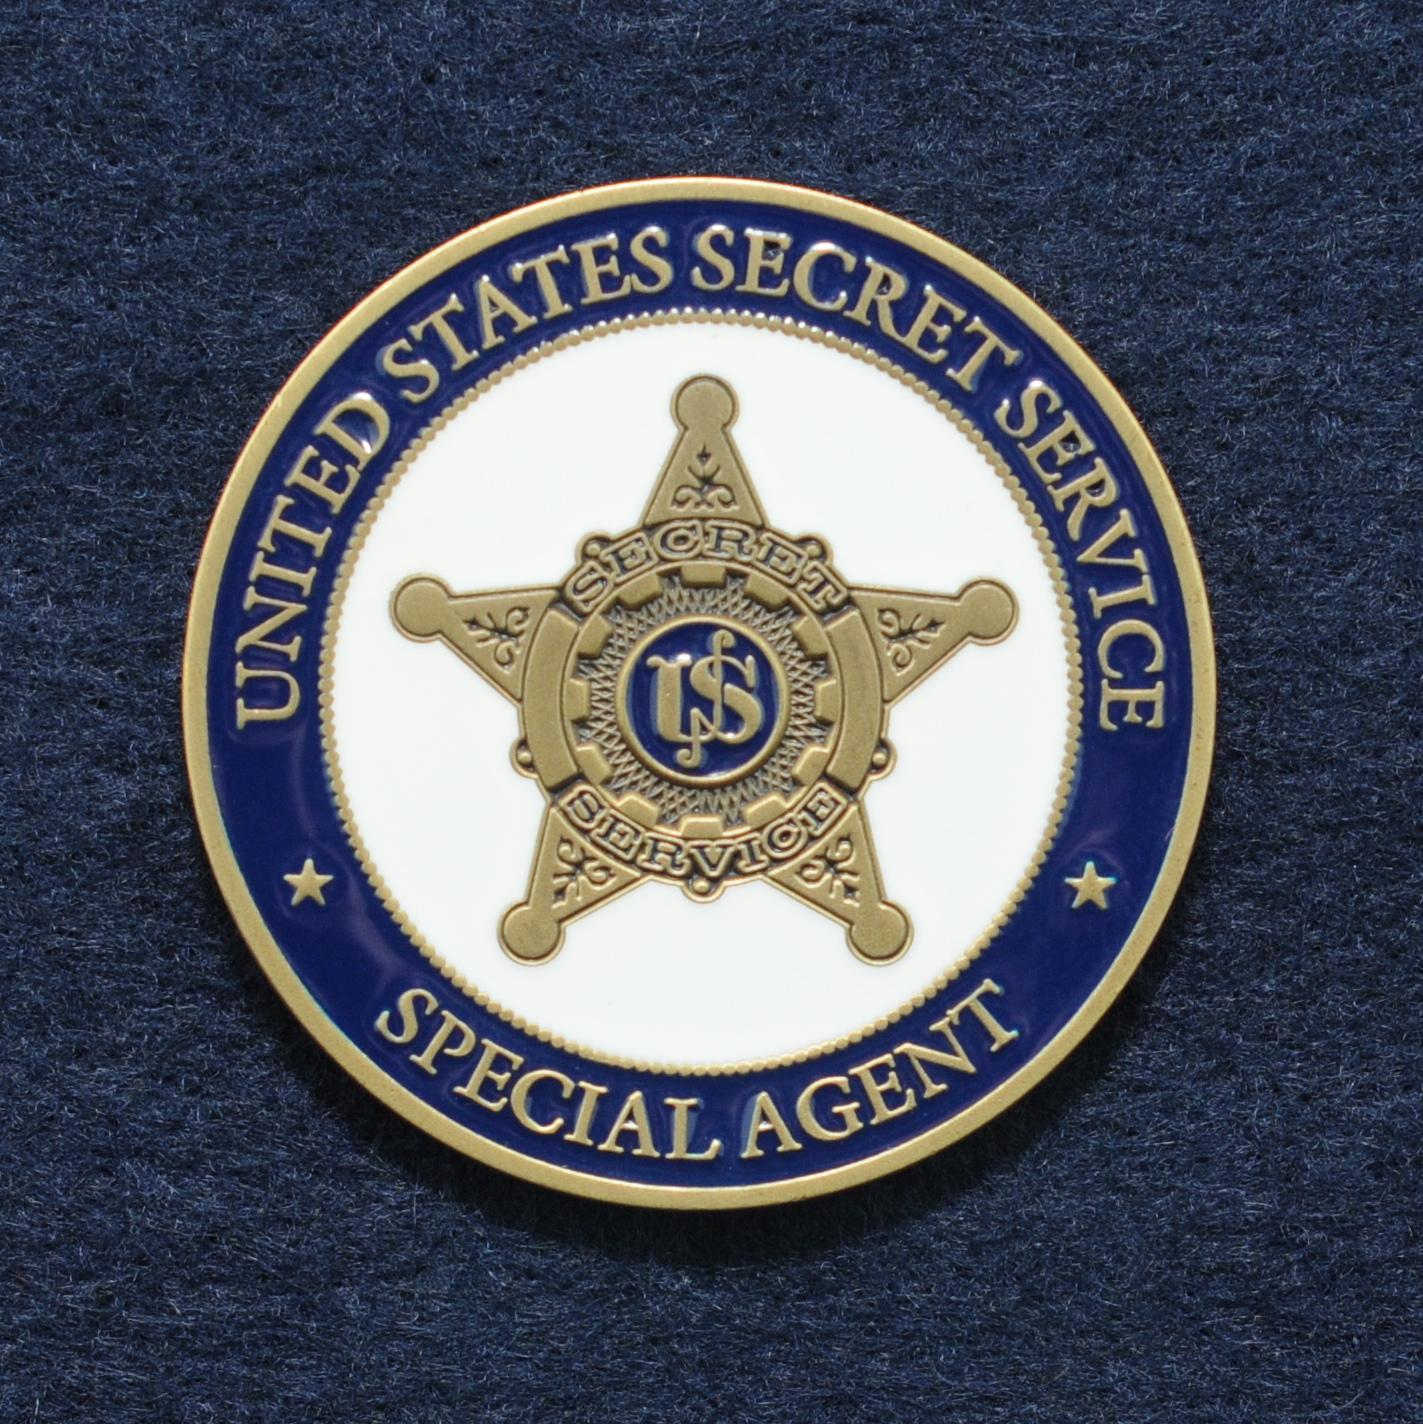 Dating a secret service agent